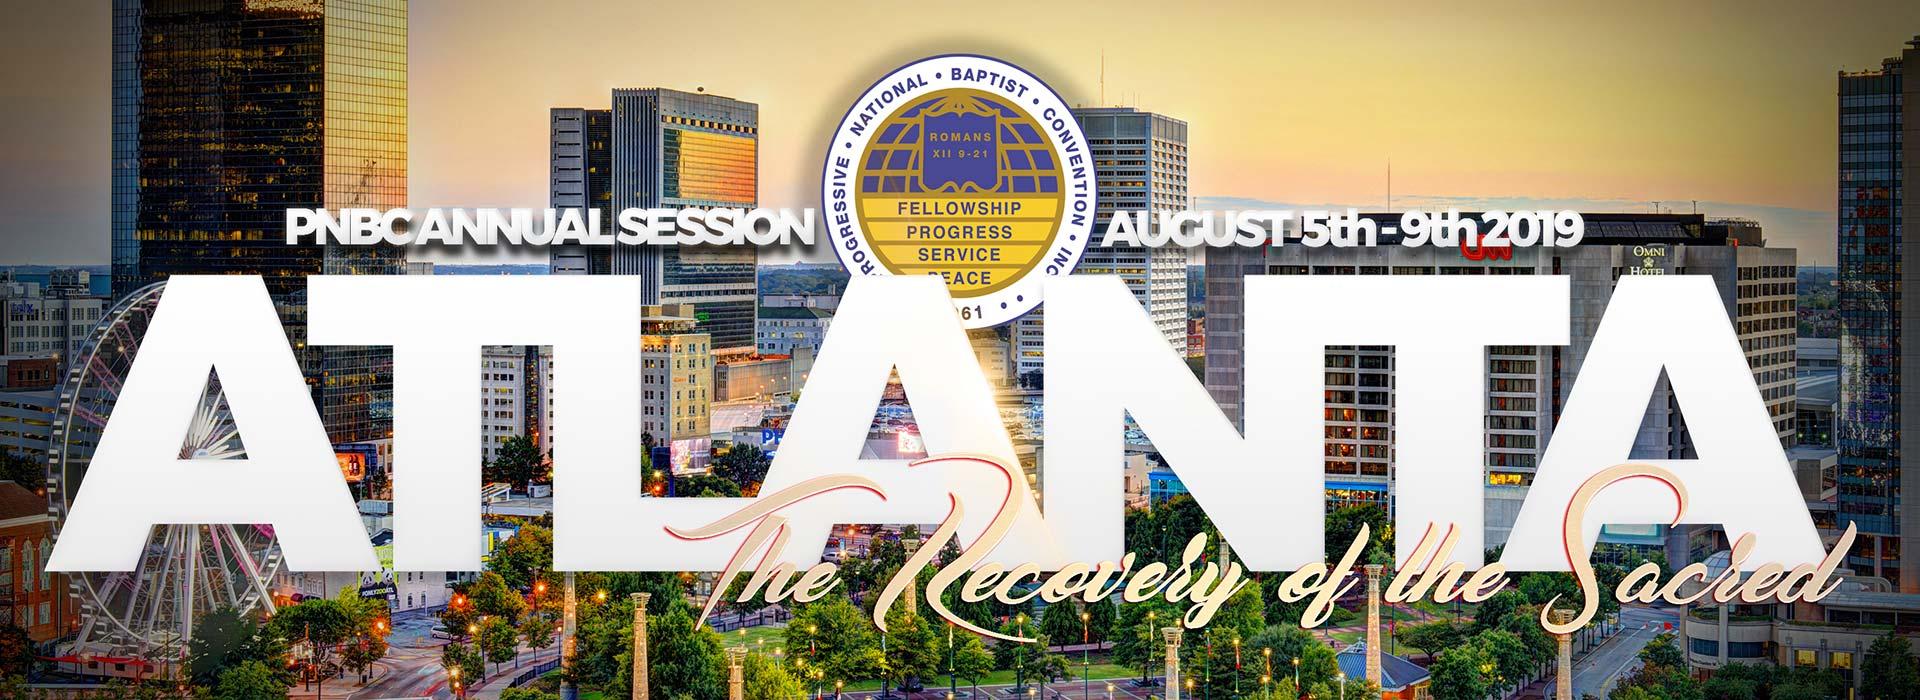 PNBC Annual Session – PNBC Inc